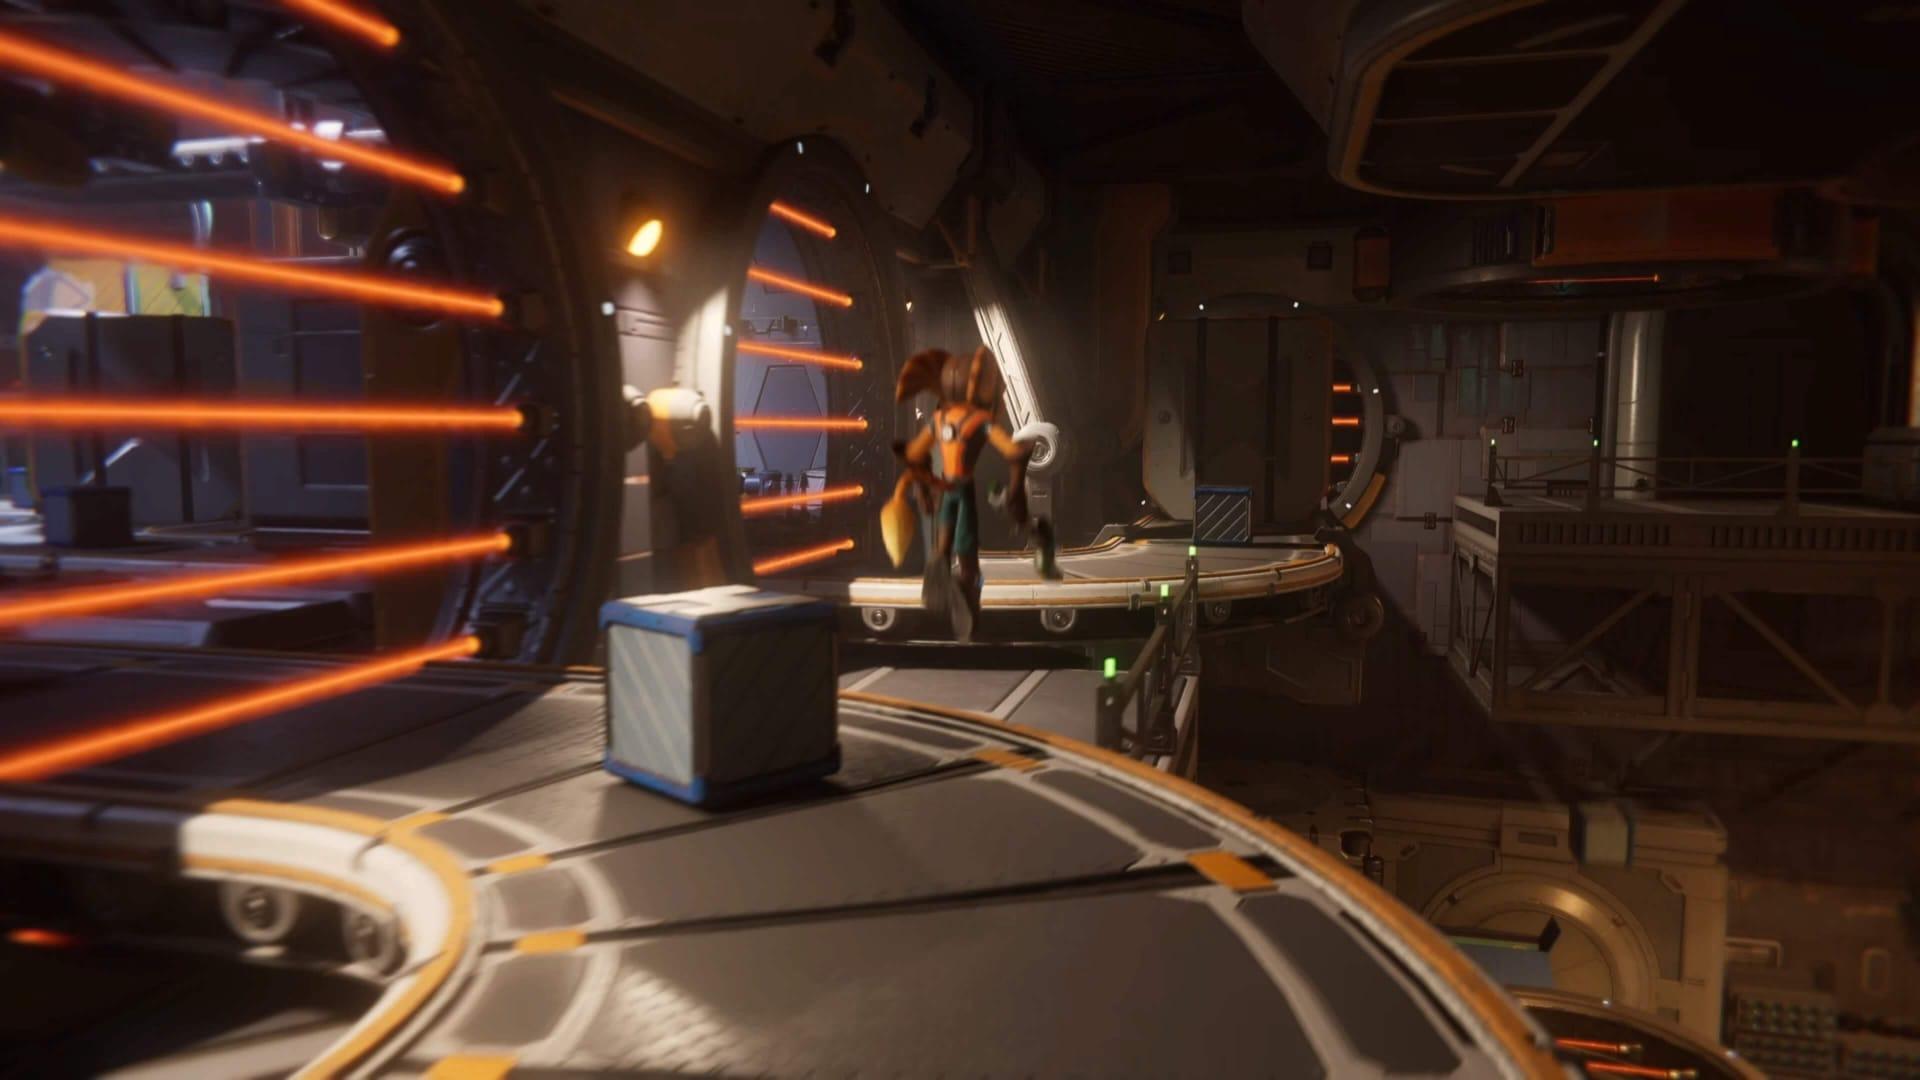 Sala de cinta transportadora de Ratchet & Clank